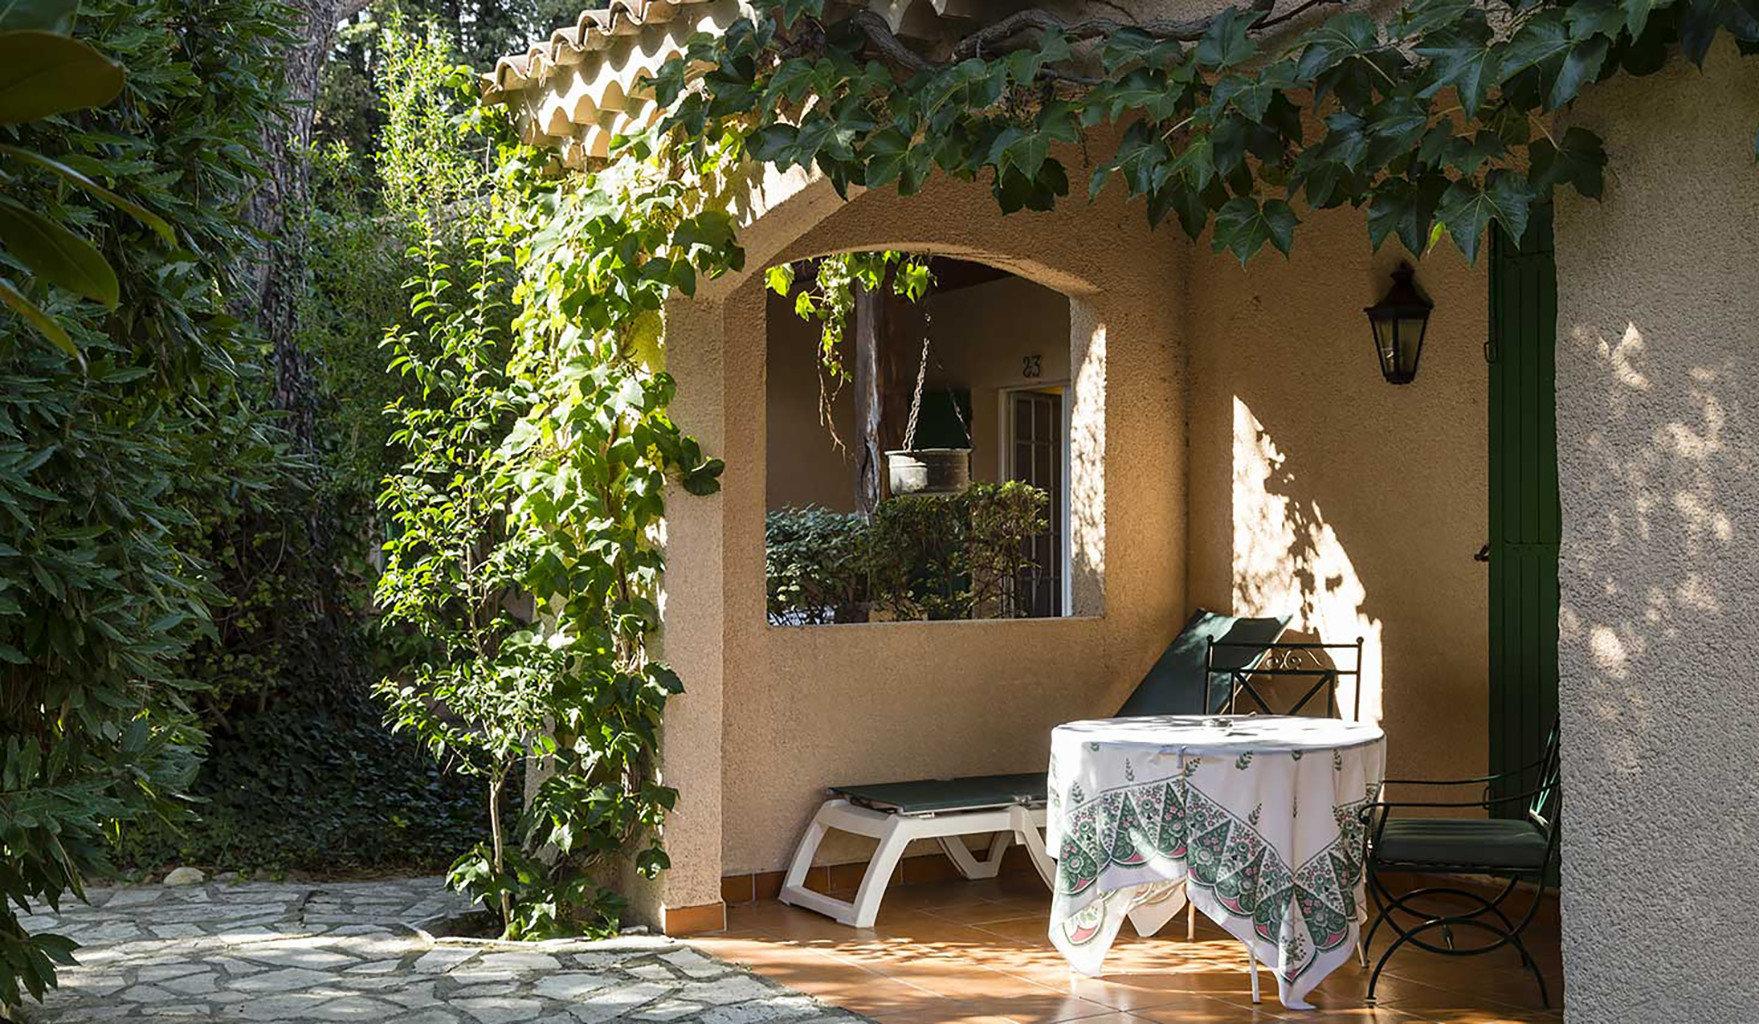 tree house property home Courtyard plant Villa backyard cottage porch outdoor structure hacienda mansion yard Garden